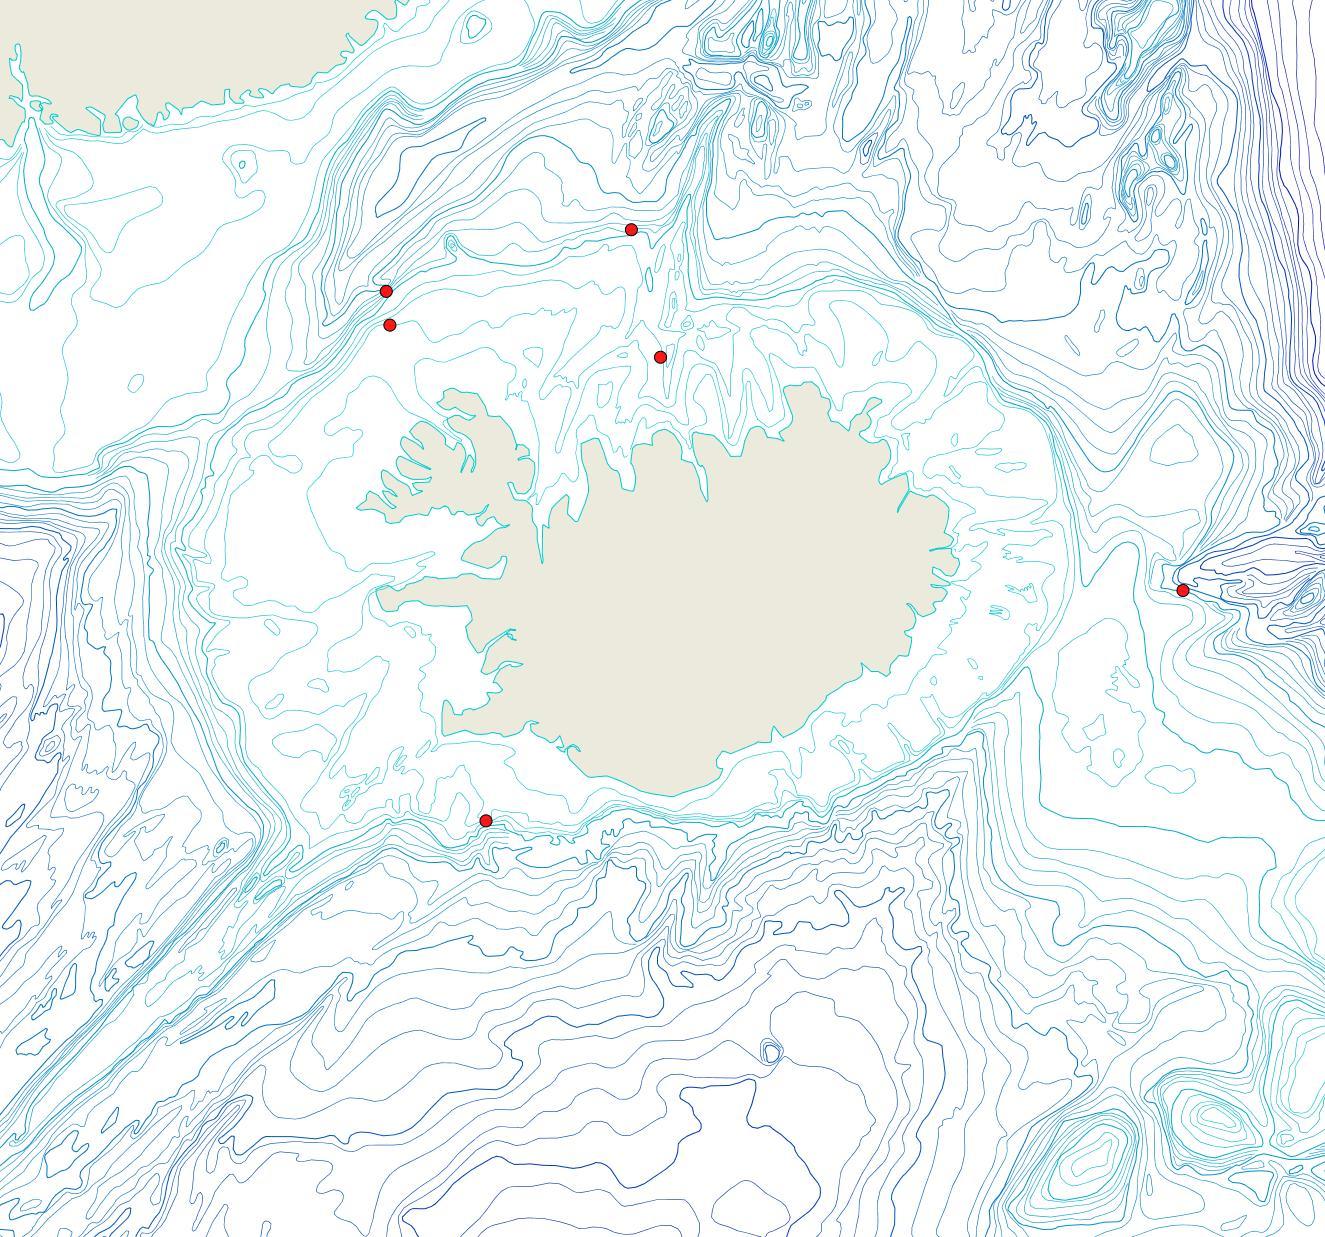 Útbreiðsla Filicrisia smitti(Bioice samples, red dots)